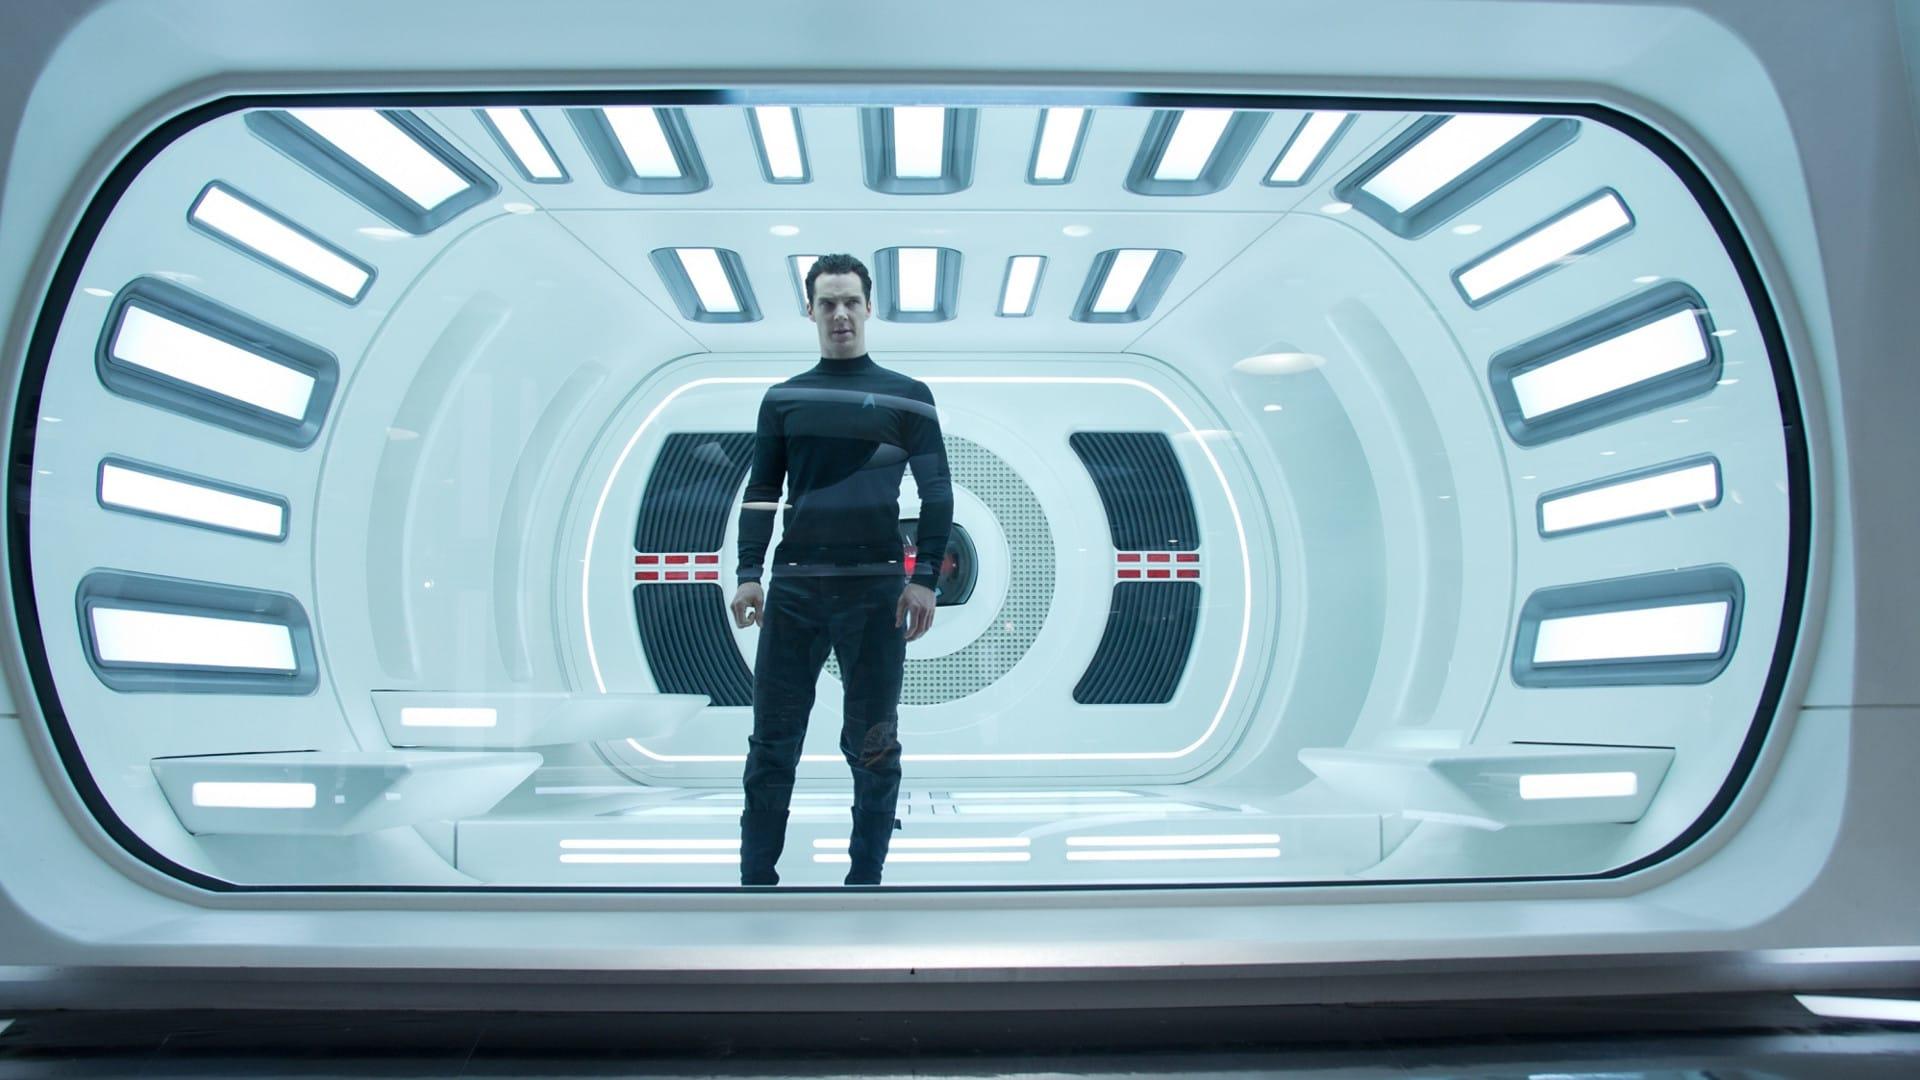 Star Trek Into Darkness backdrop